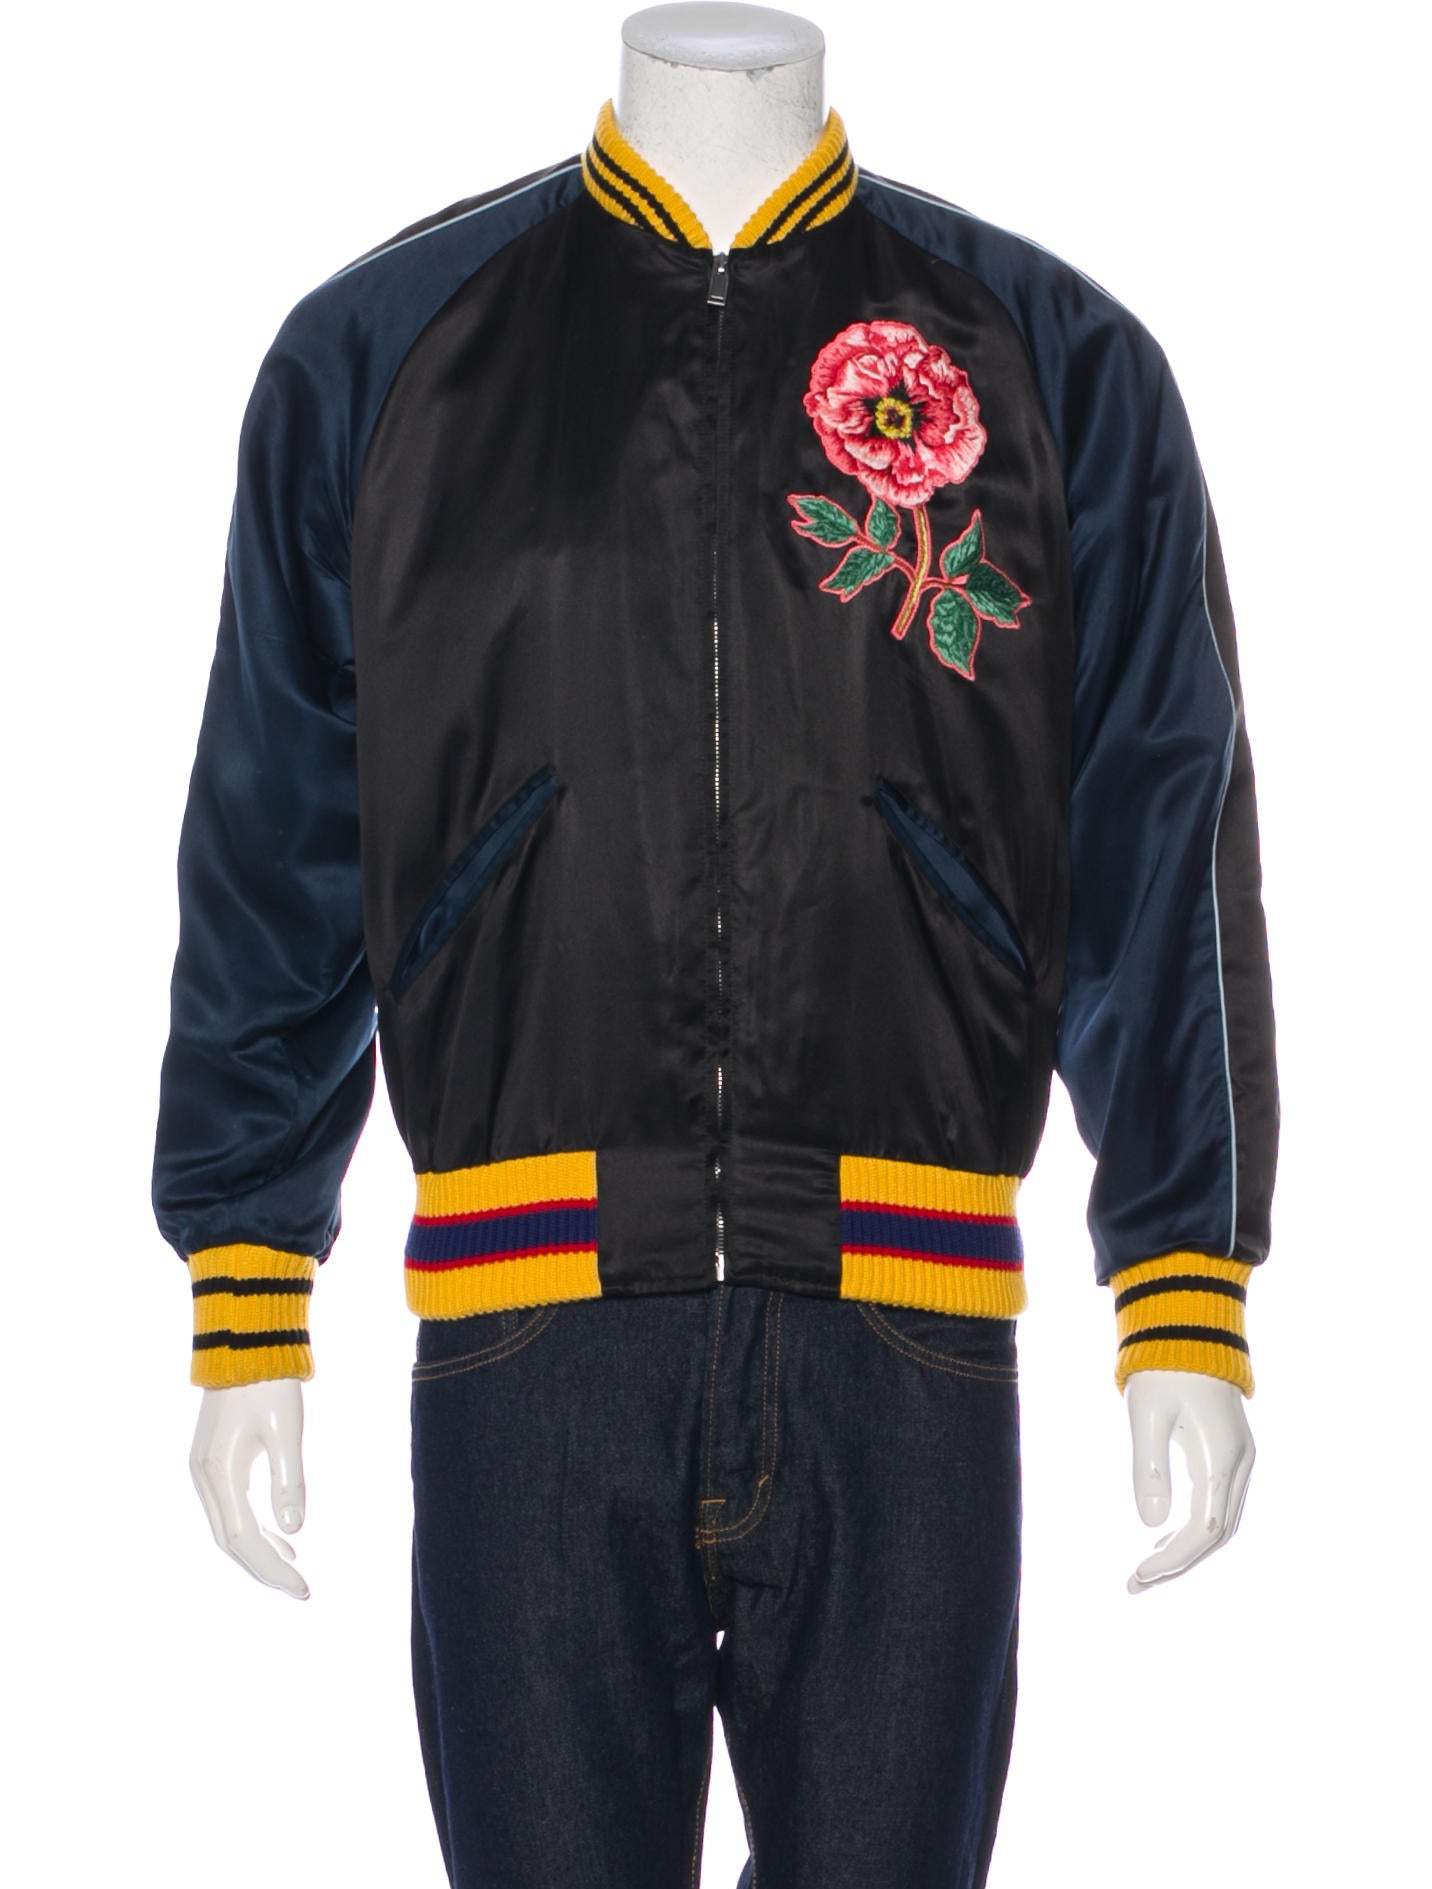 2be831c23 Gucci 2016 Silk-Blend 'L'Aveugle Par Amour' Bomber Jacket - Clothing ...